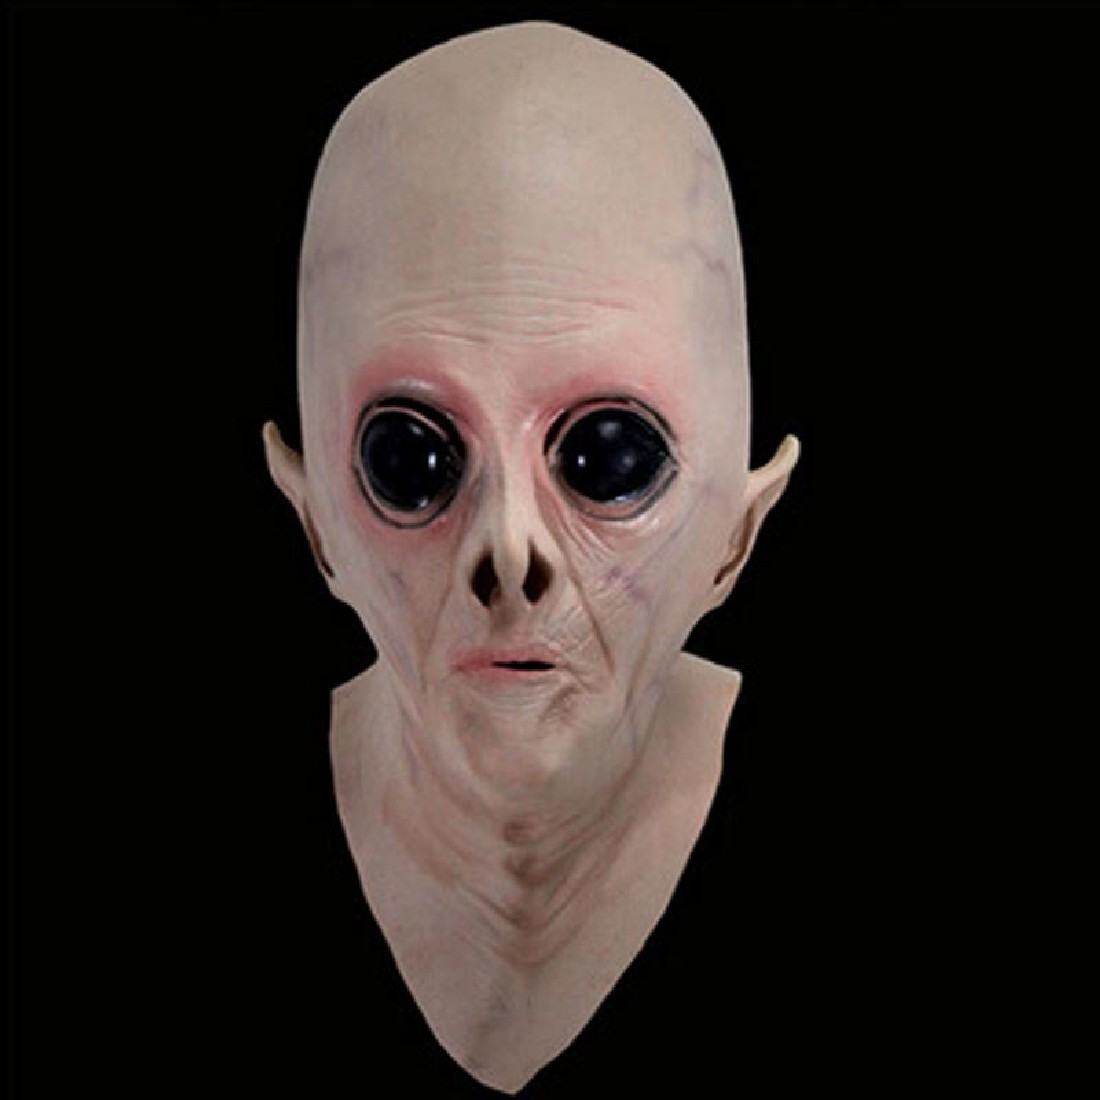 Online Get Cheap Aliens Mask -Aliexpress.com | Alibaba Group